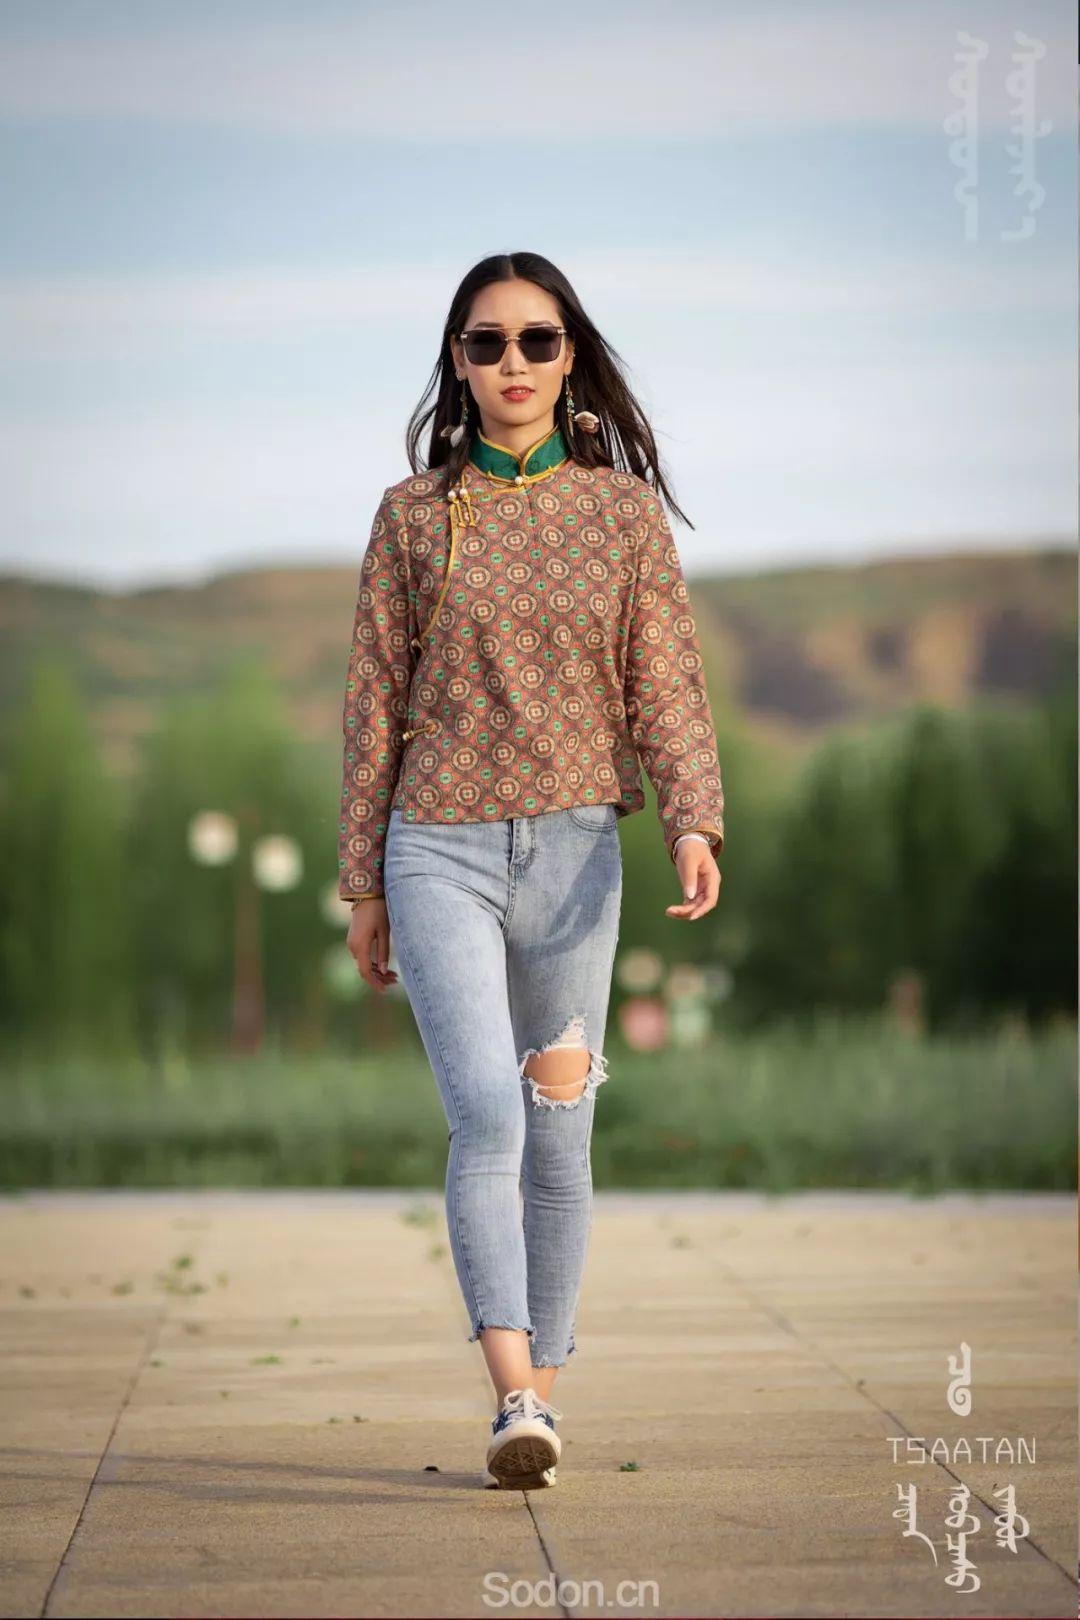 TSAATAN蒙古时装 2019夏季新款首发 第7张